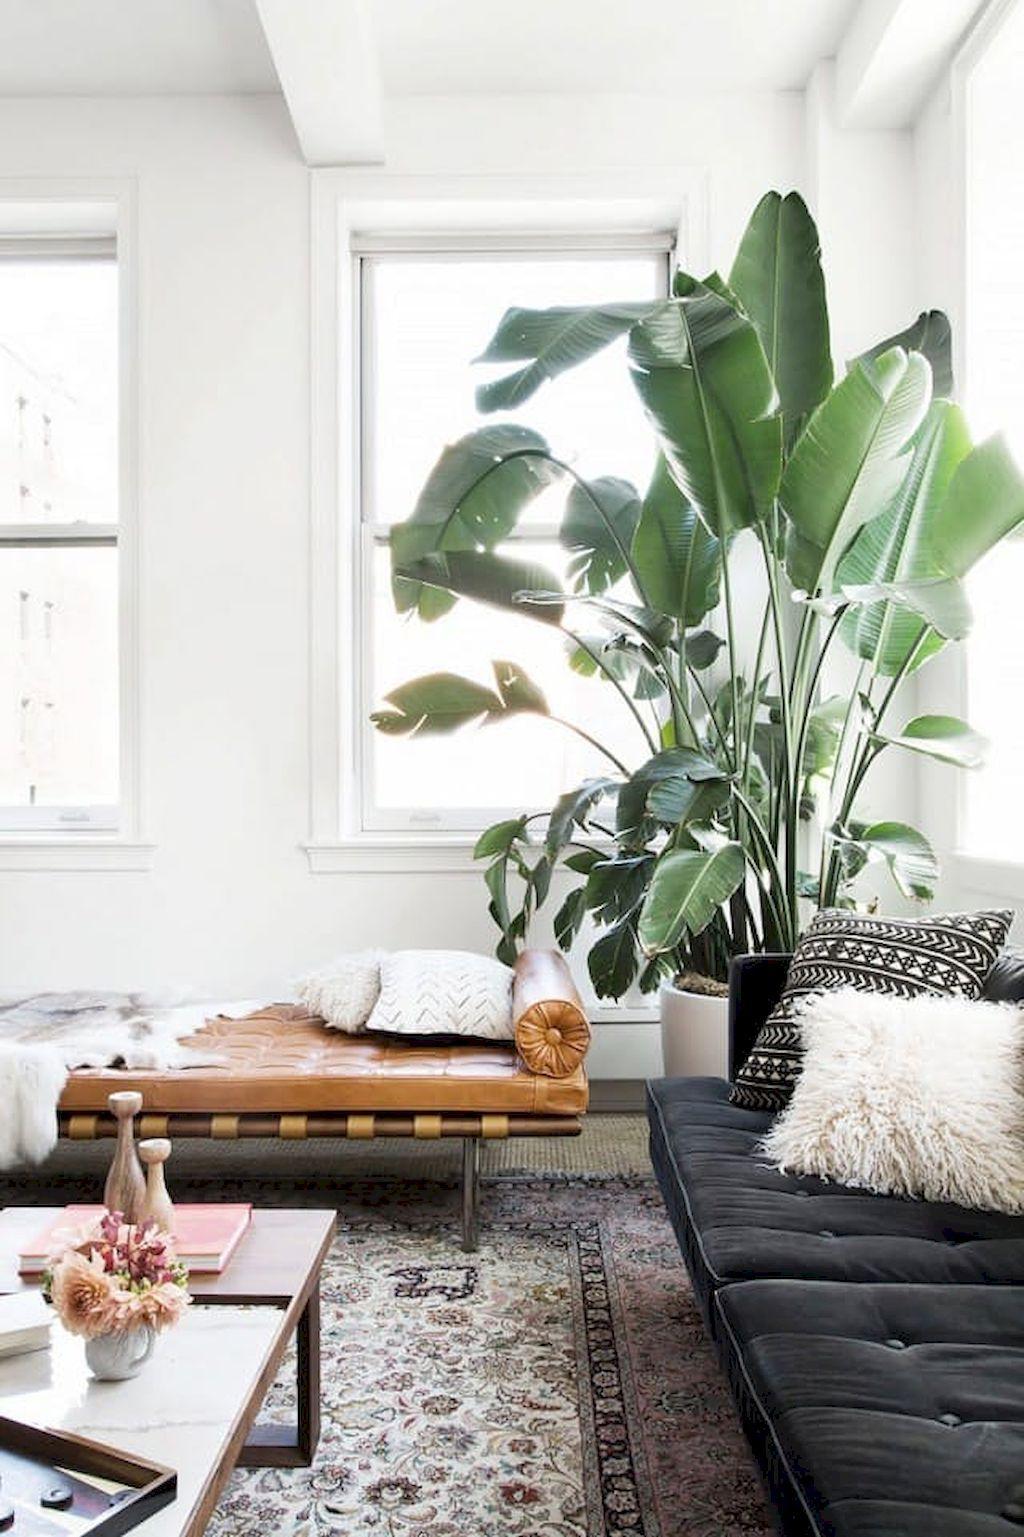 Gorgeous 53 Amazing Ideas To Display Your Indoor Plants  Https://besideroom.com